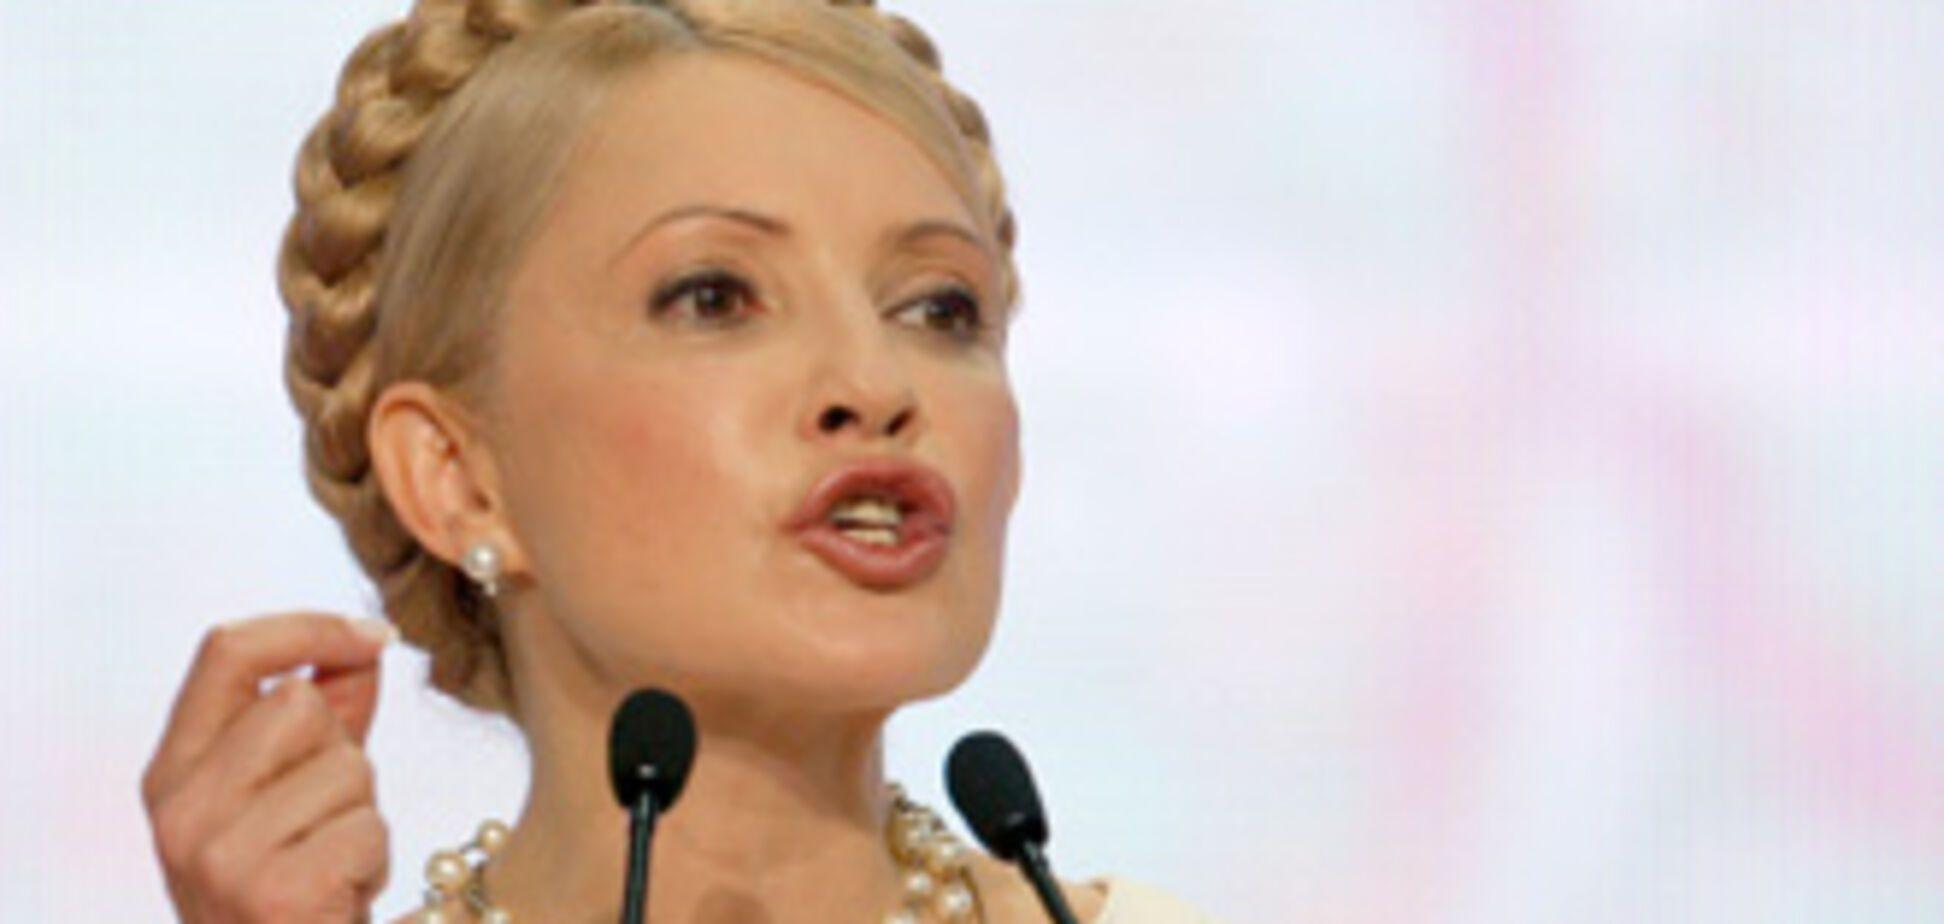 Тимошенко опустилась на 30 позиций